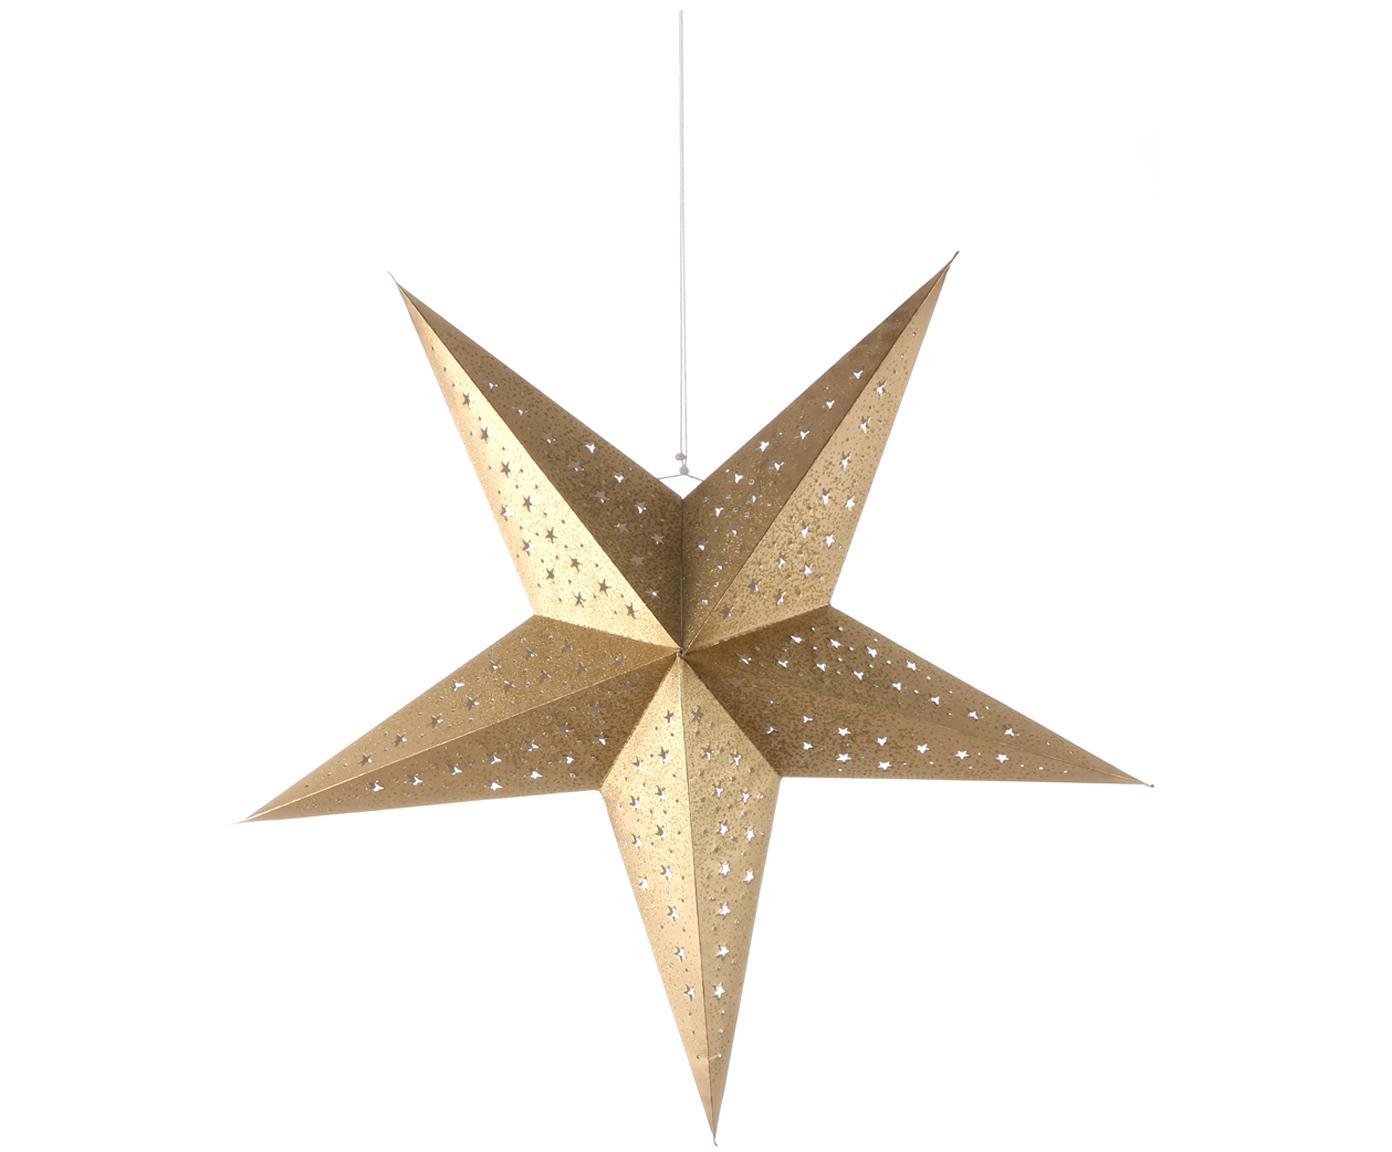 Kerstster Esther, Papier, Goudkleurig met glitters, 75 x 75 cm